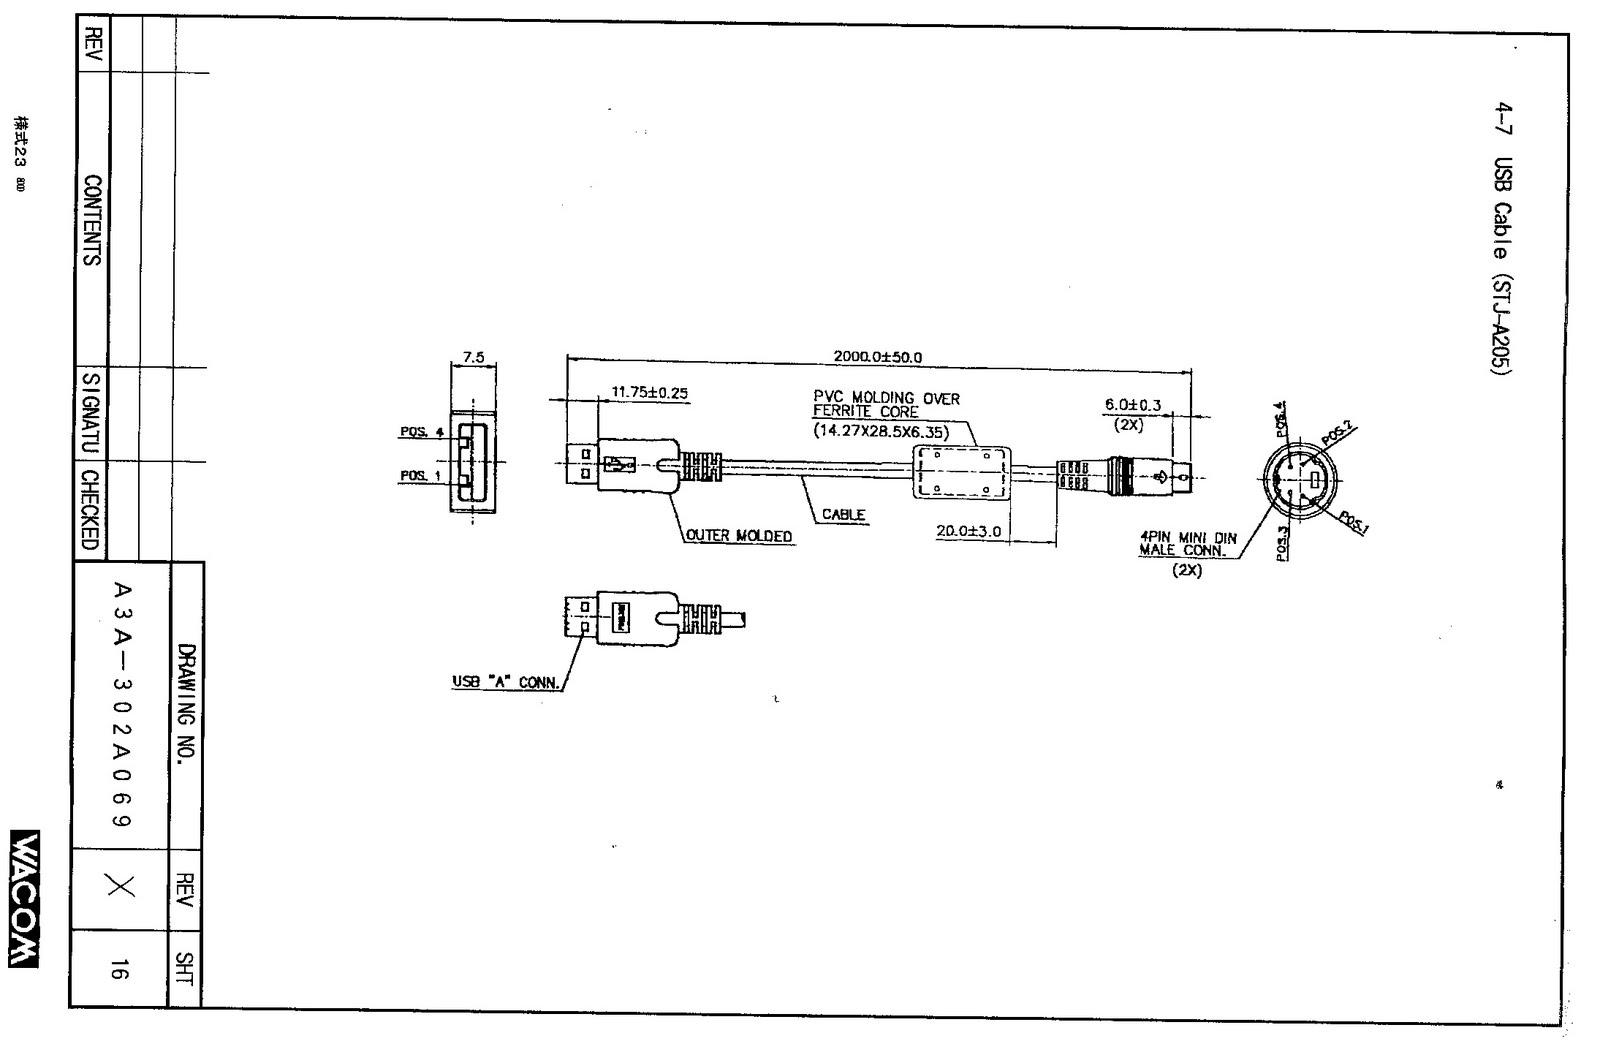 S Video Cable Diagram Jvc Kd R650 Car Stereo Wiring Mongadillo Blog Make Your Own Wacom Cintiq 15 Usb